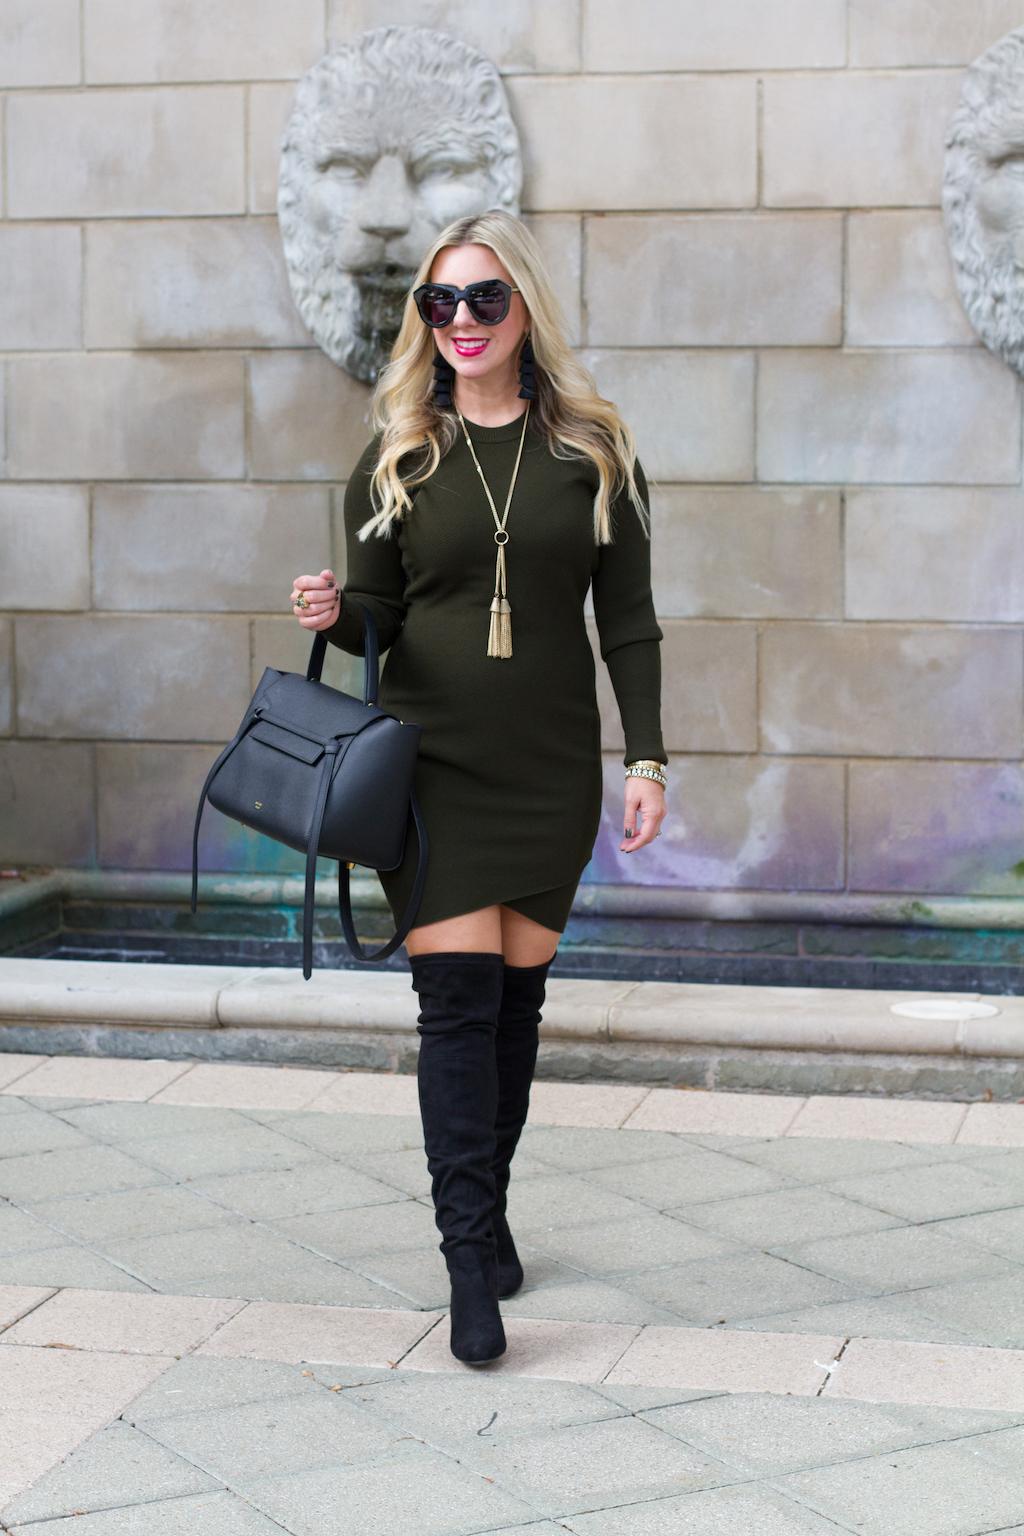 Sweater Dress | The Darling Petite Diva